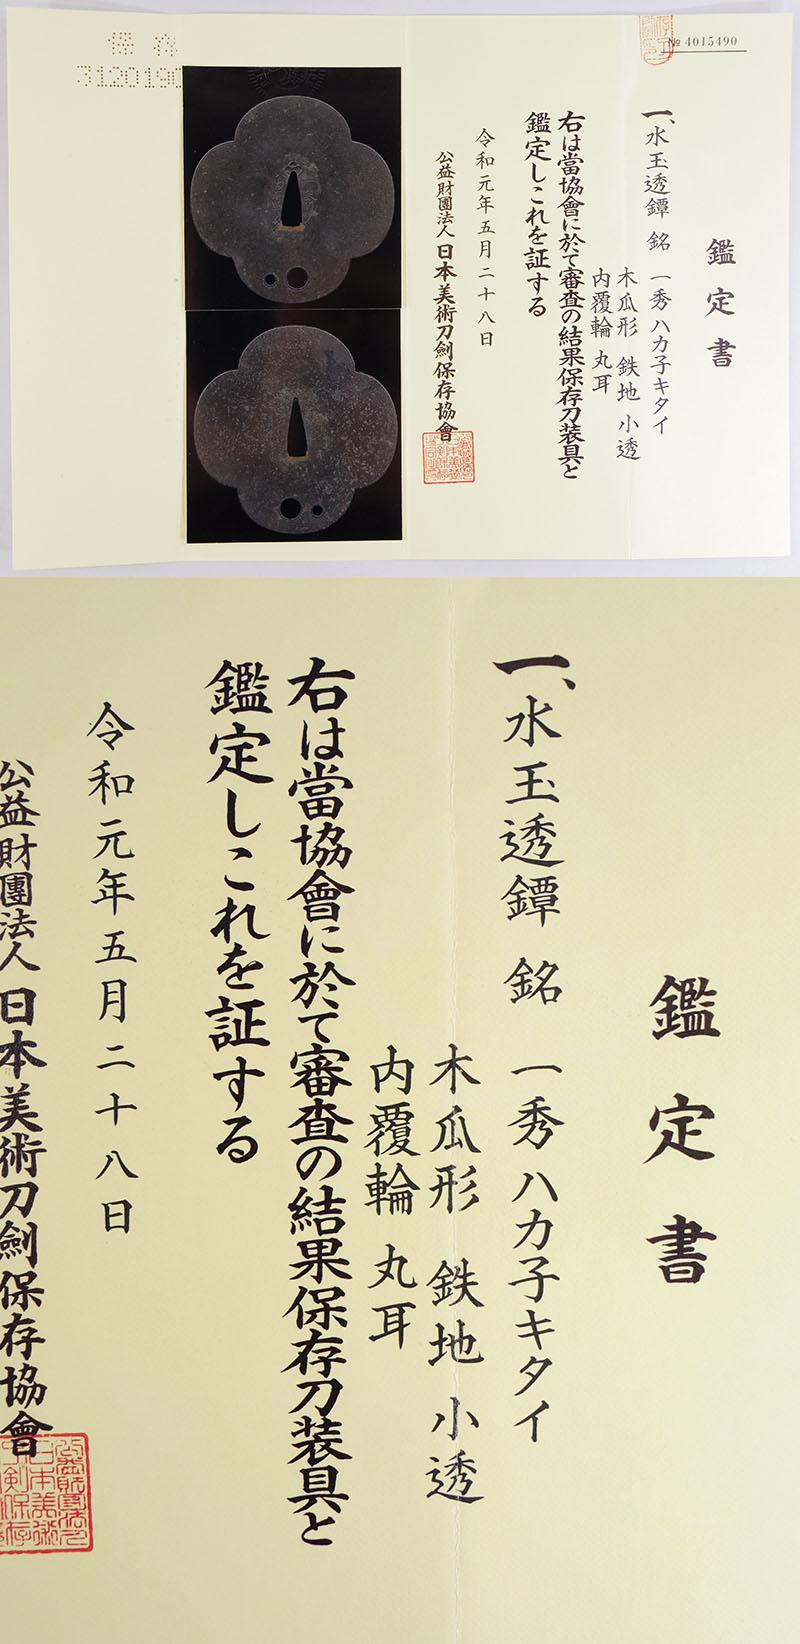 水玉透鍔 一秀ハカ子キタイ(池田一秀)(刀匠鍔)(庄内藩主酒井家抱え工) Picture of Certificate